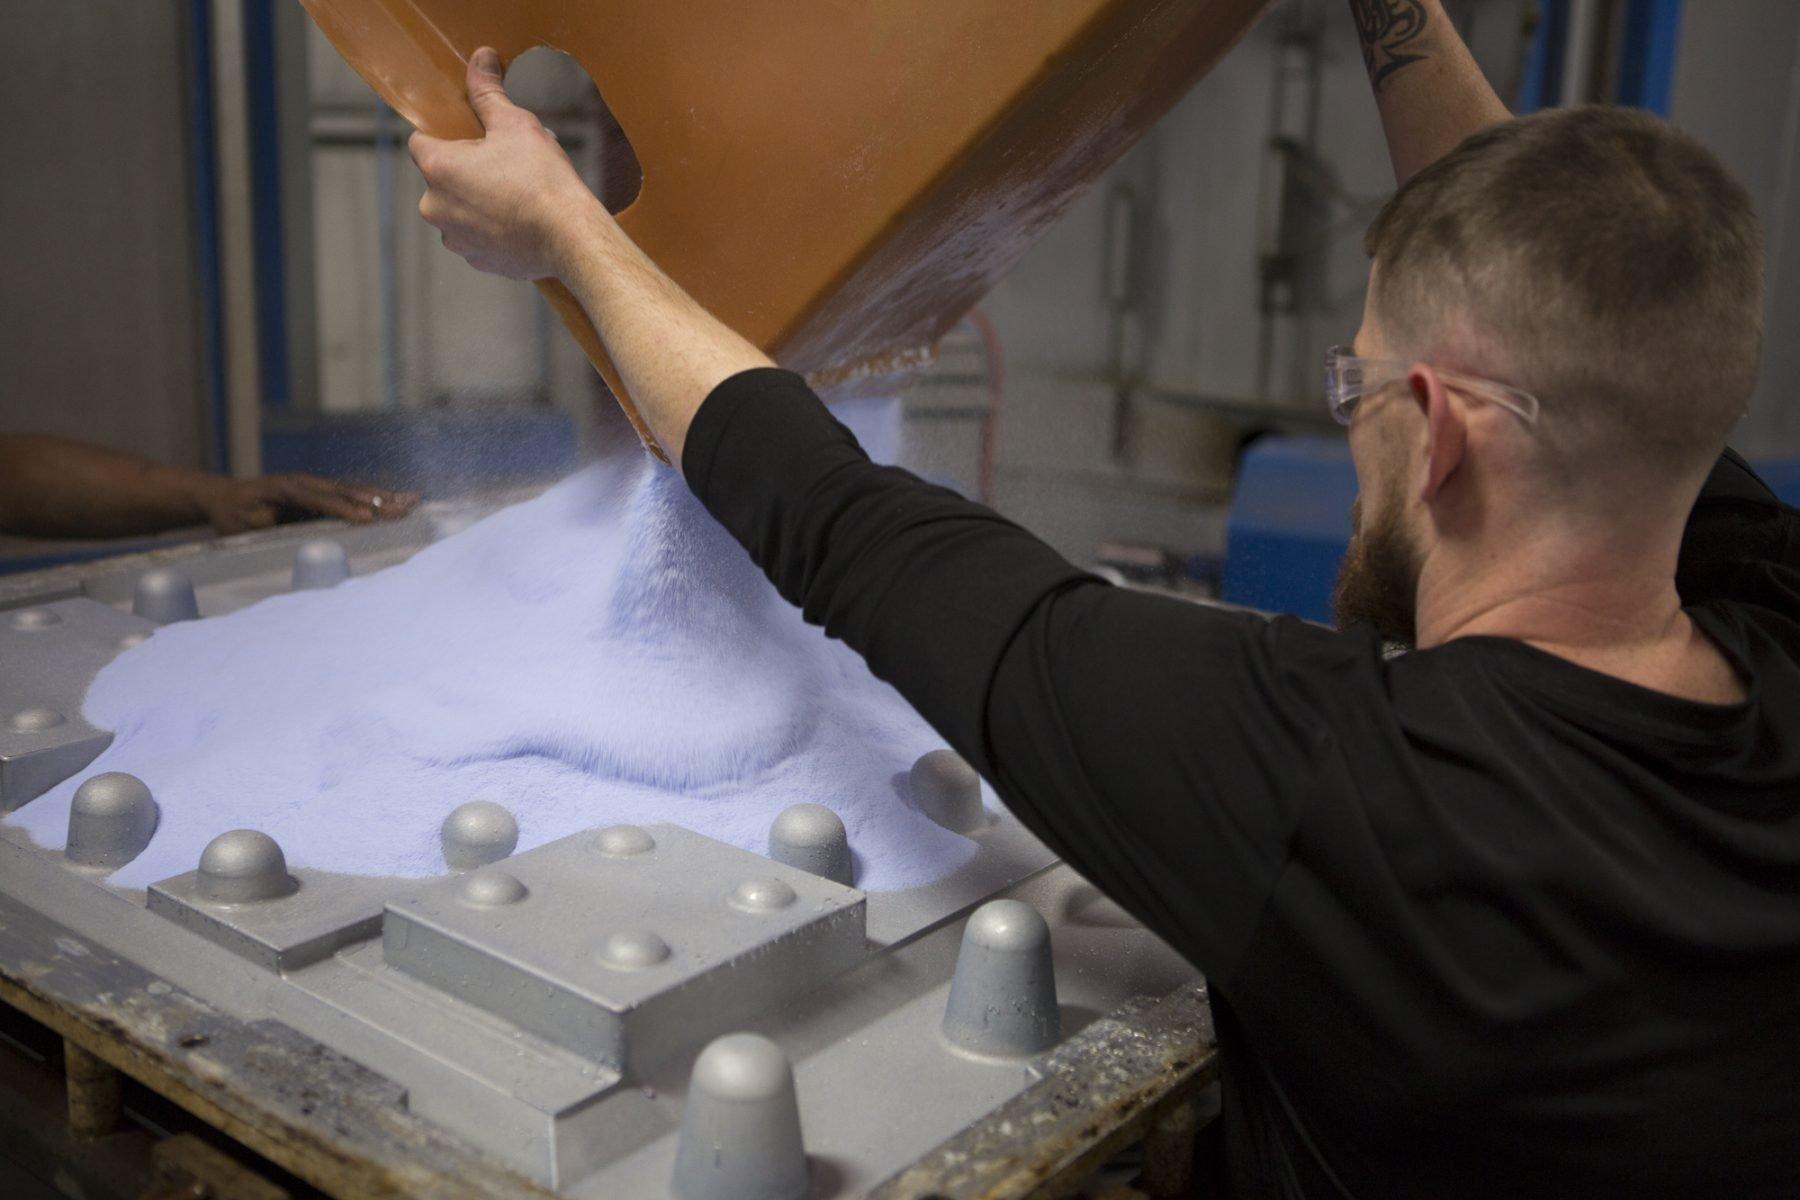 Jeco-Plastics-Commercial-Photography-Website-Plainfield-Indiana-8